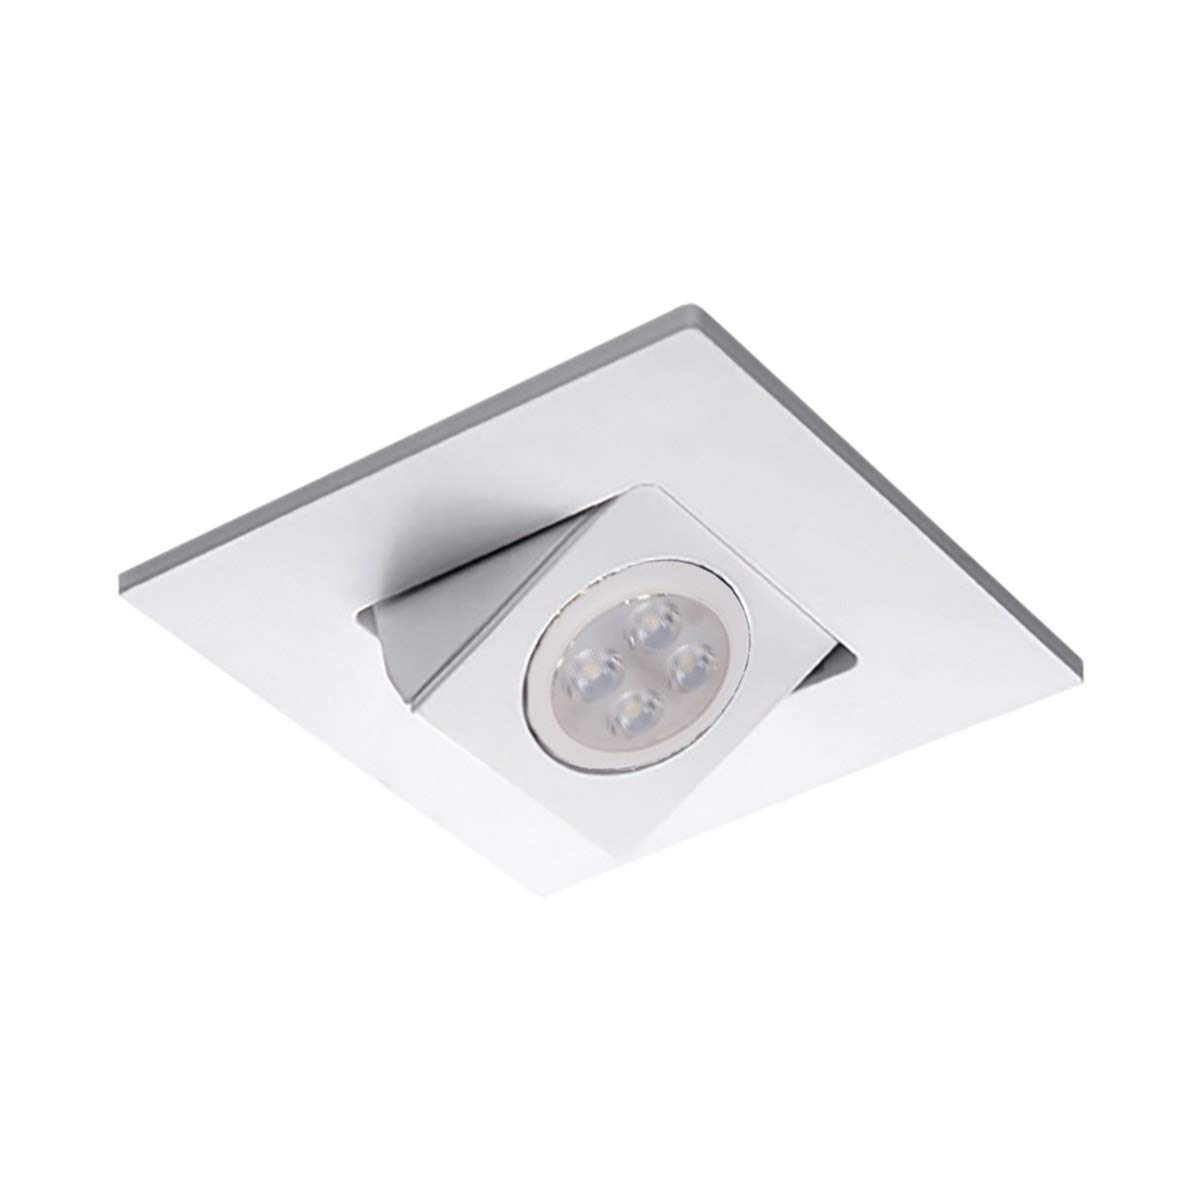 WAC Lighting HR-D416LED-WT 4インチ 正方形 調節可能 方向性 トリム LED 埋め込みライト 4インチ 低電圧   B07N1LVKWT